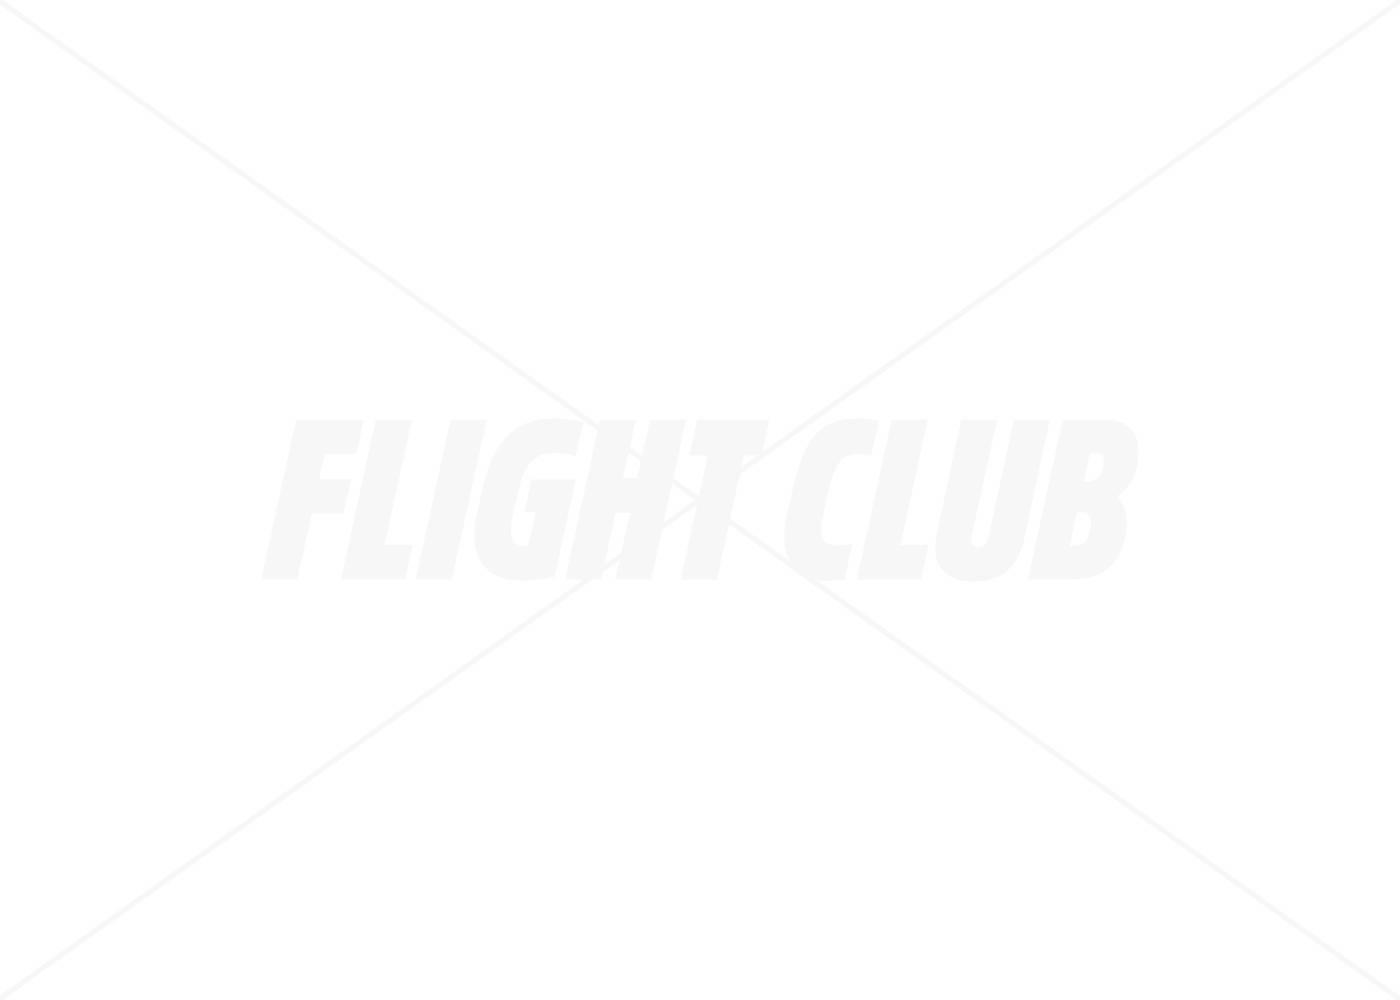 nassusa additionally Eddie Bauer 8367 furthermore Nike Nike 4084mag Set also Flight Club Big Chill Double Thick 24oz Pullover Hoody Heather Grey Navy 701099 additionally Flexon Flexon Jones Black Chrome. on us navy inventory